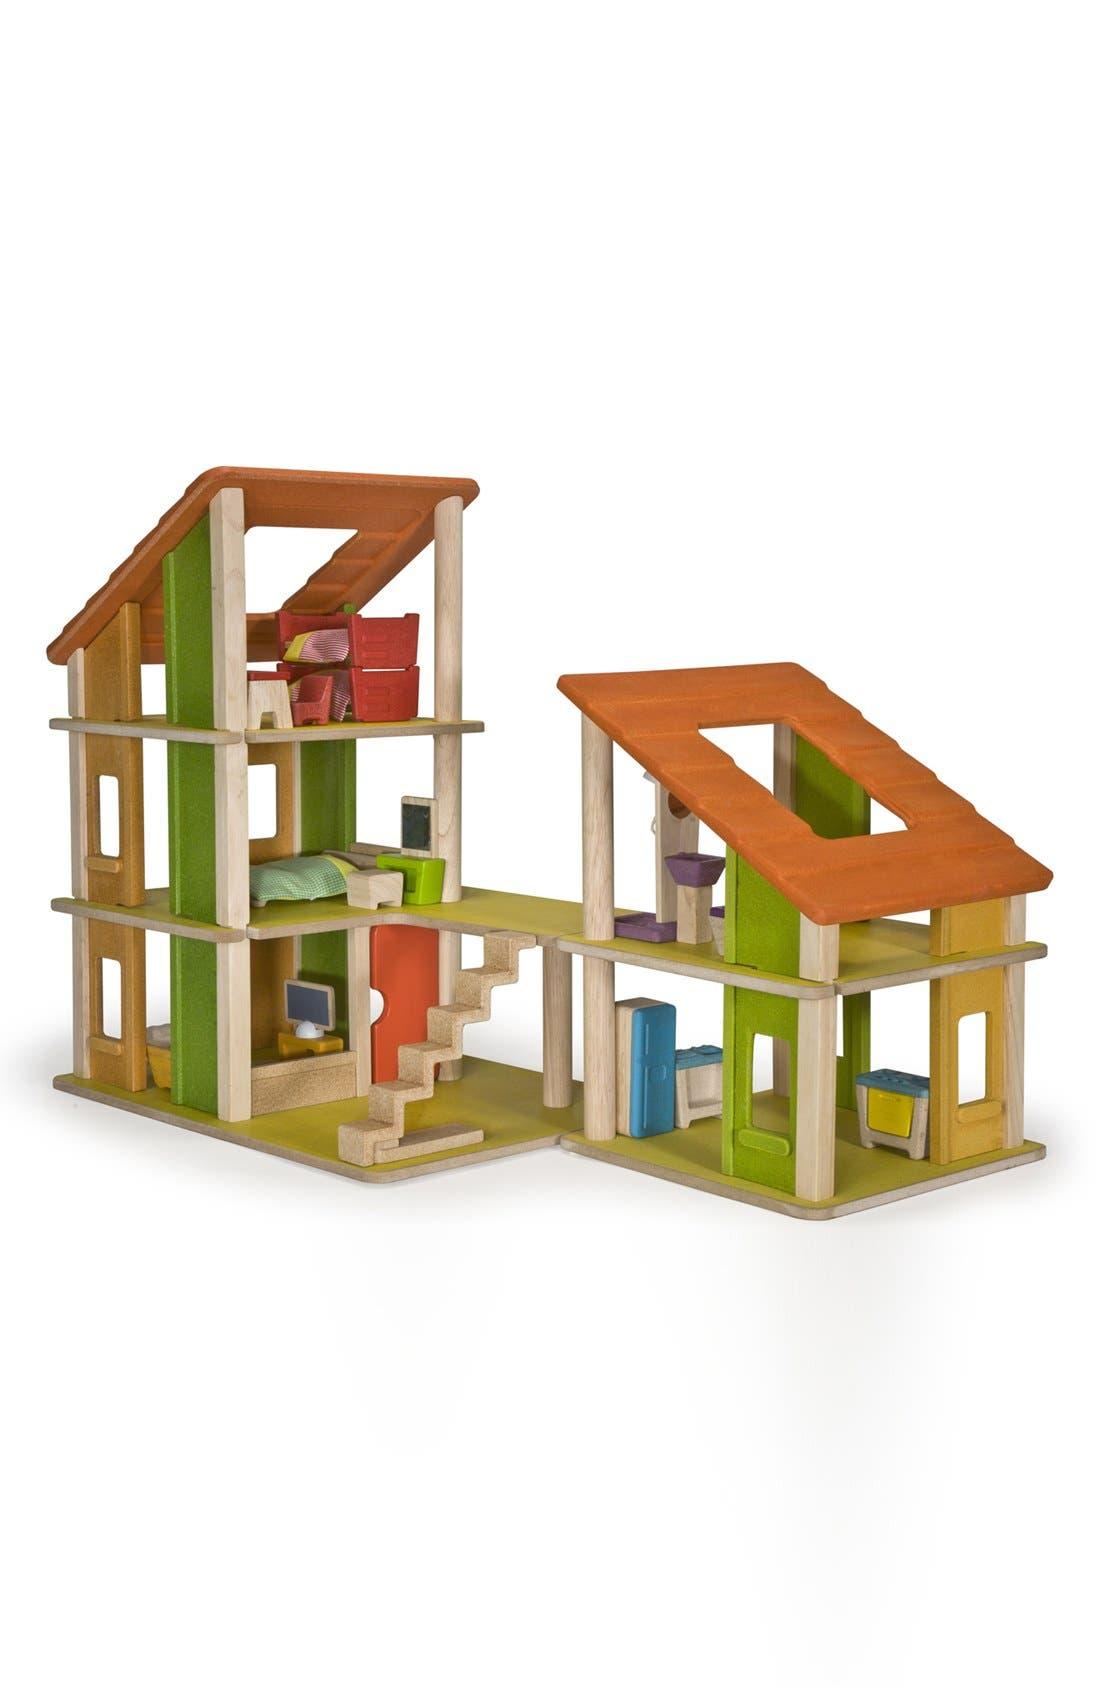 Alternate Image 1 Selected - PlanToys® 'Chalet' Wooden Dollhouse & Furniture